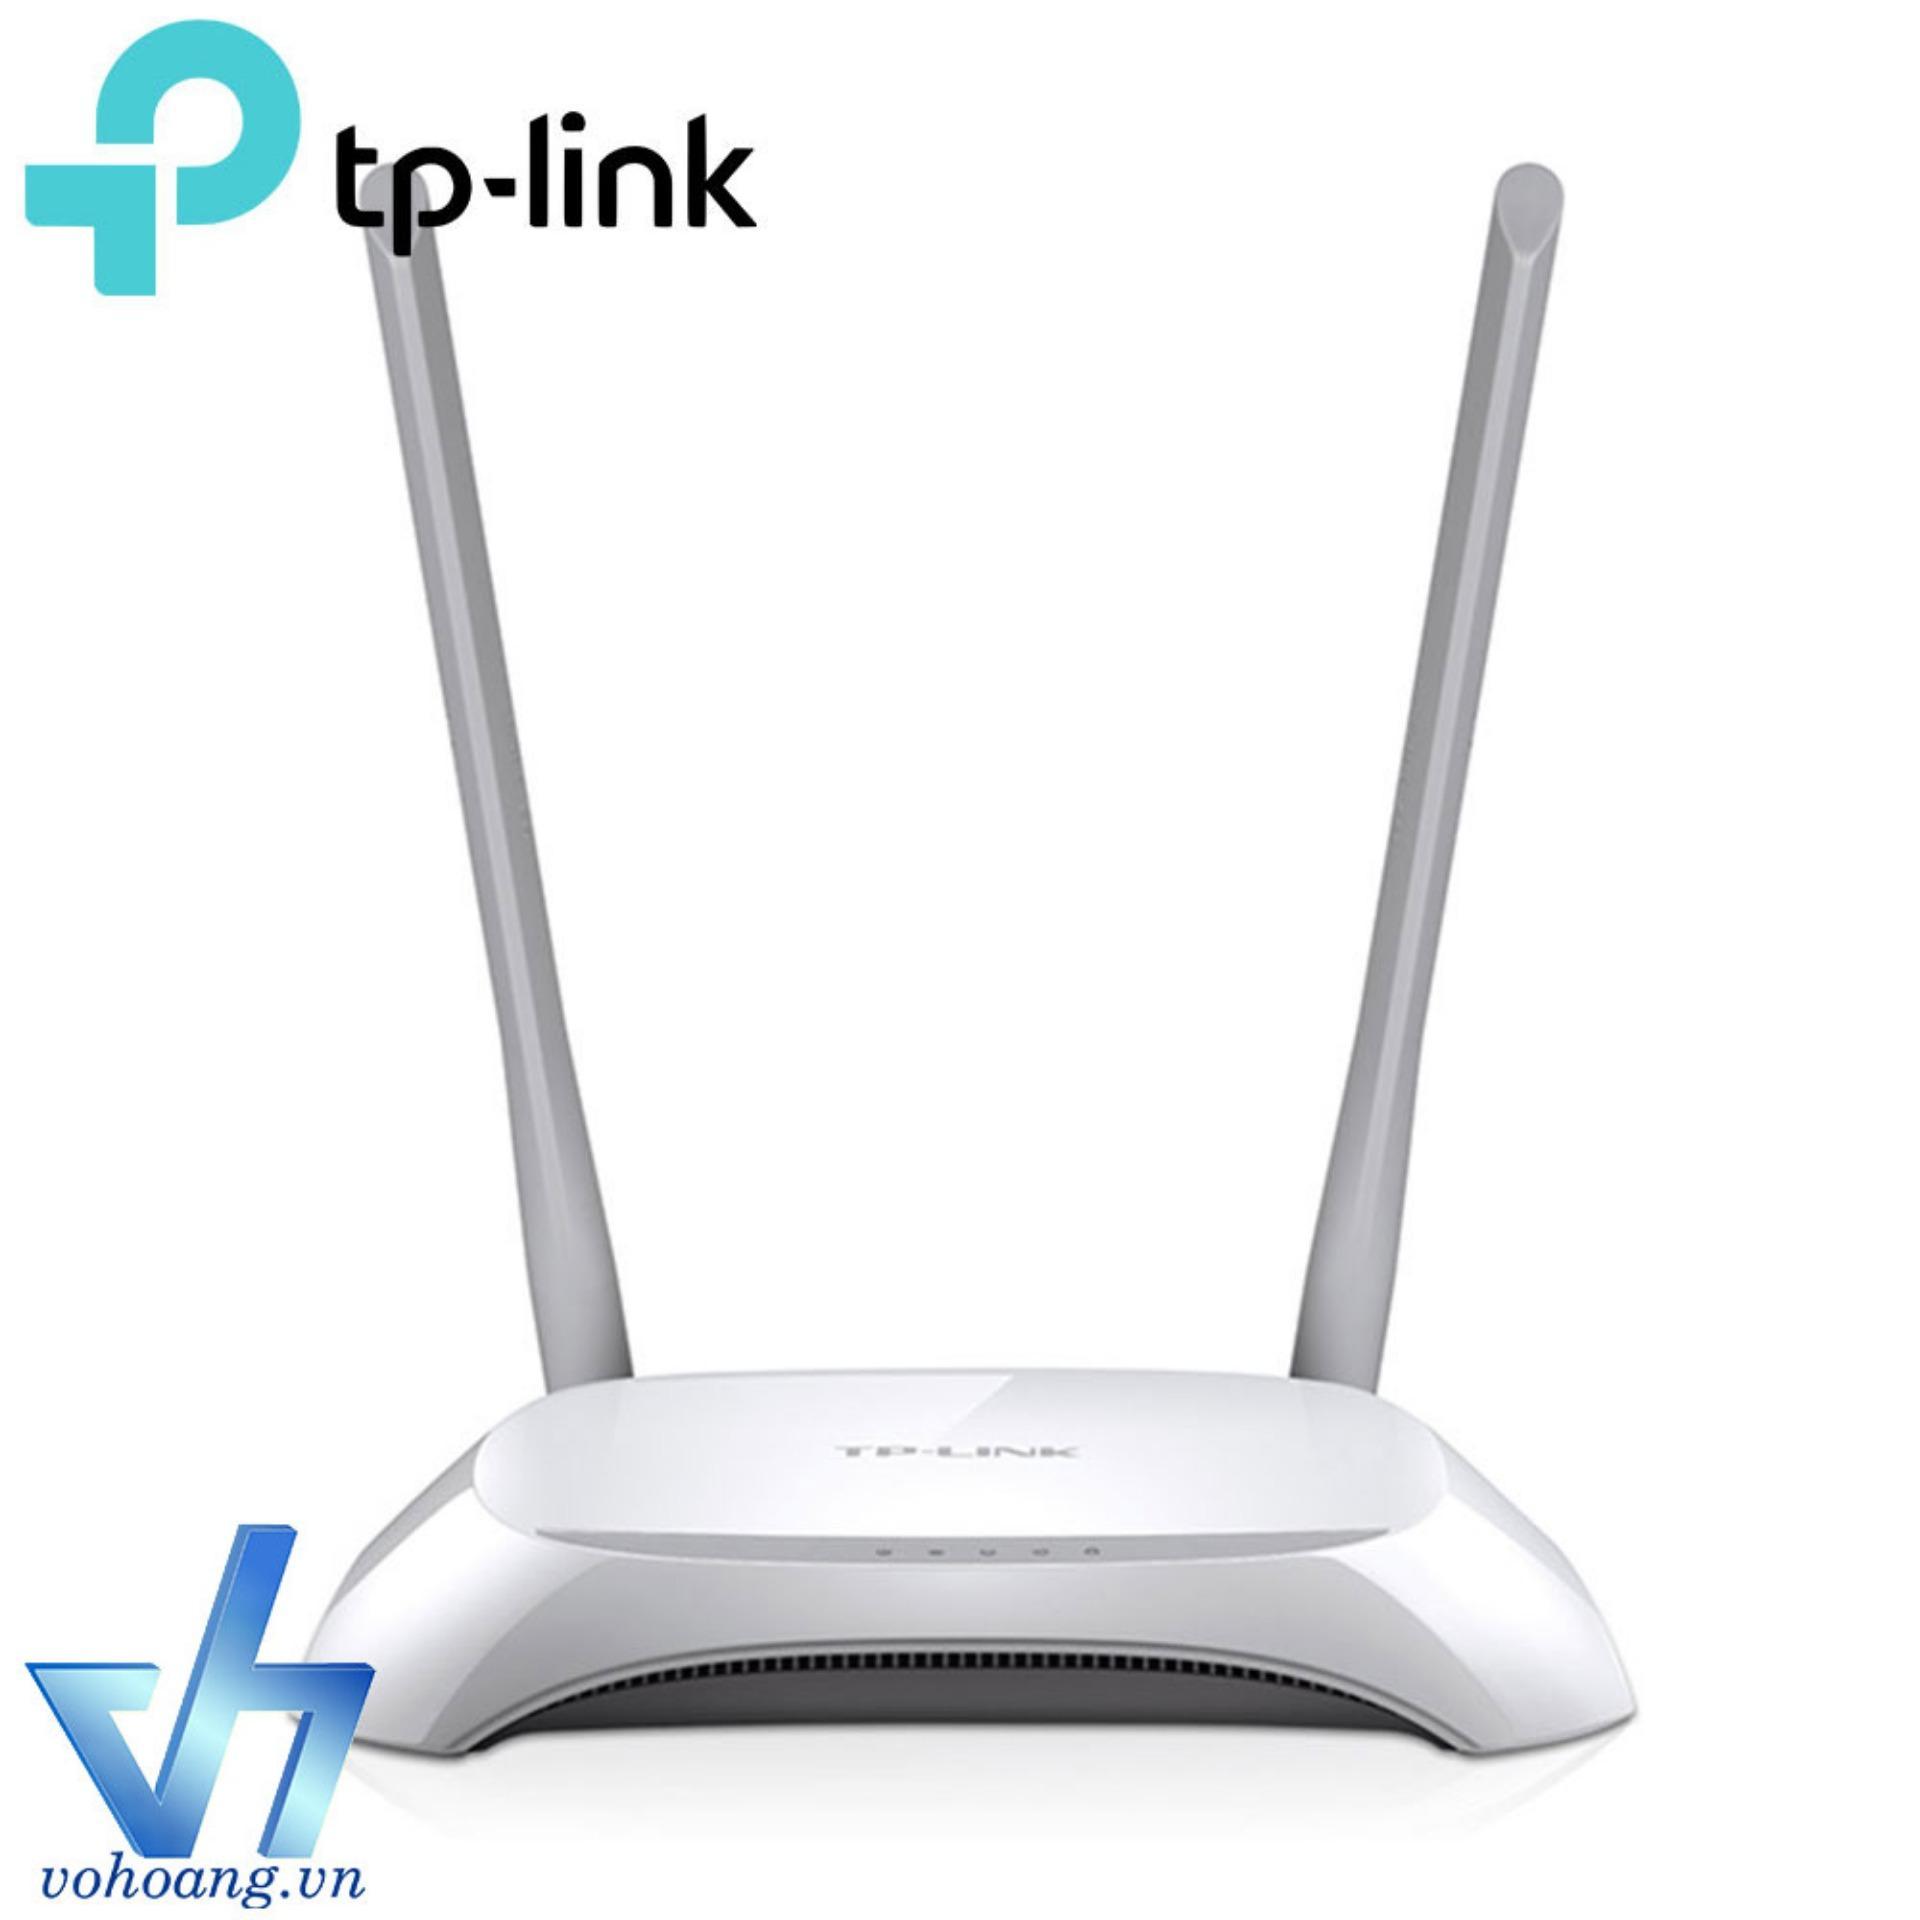 Mua Router Tp Link Online Gi Tt Tl Wr 840n Wireless Tplink 300mbps Wr840n Wi Fi Chun N